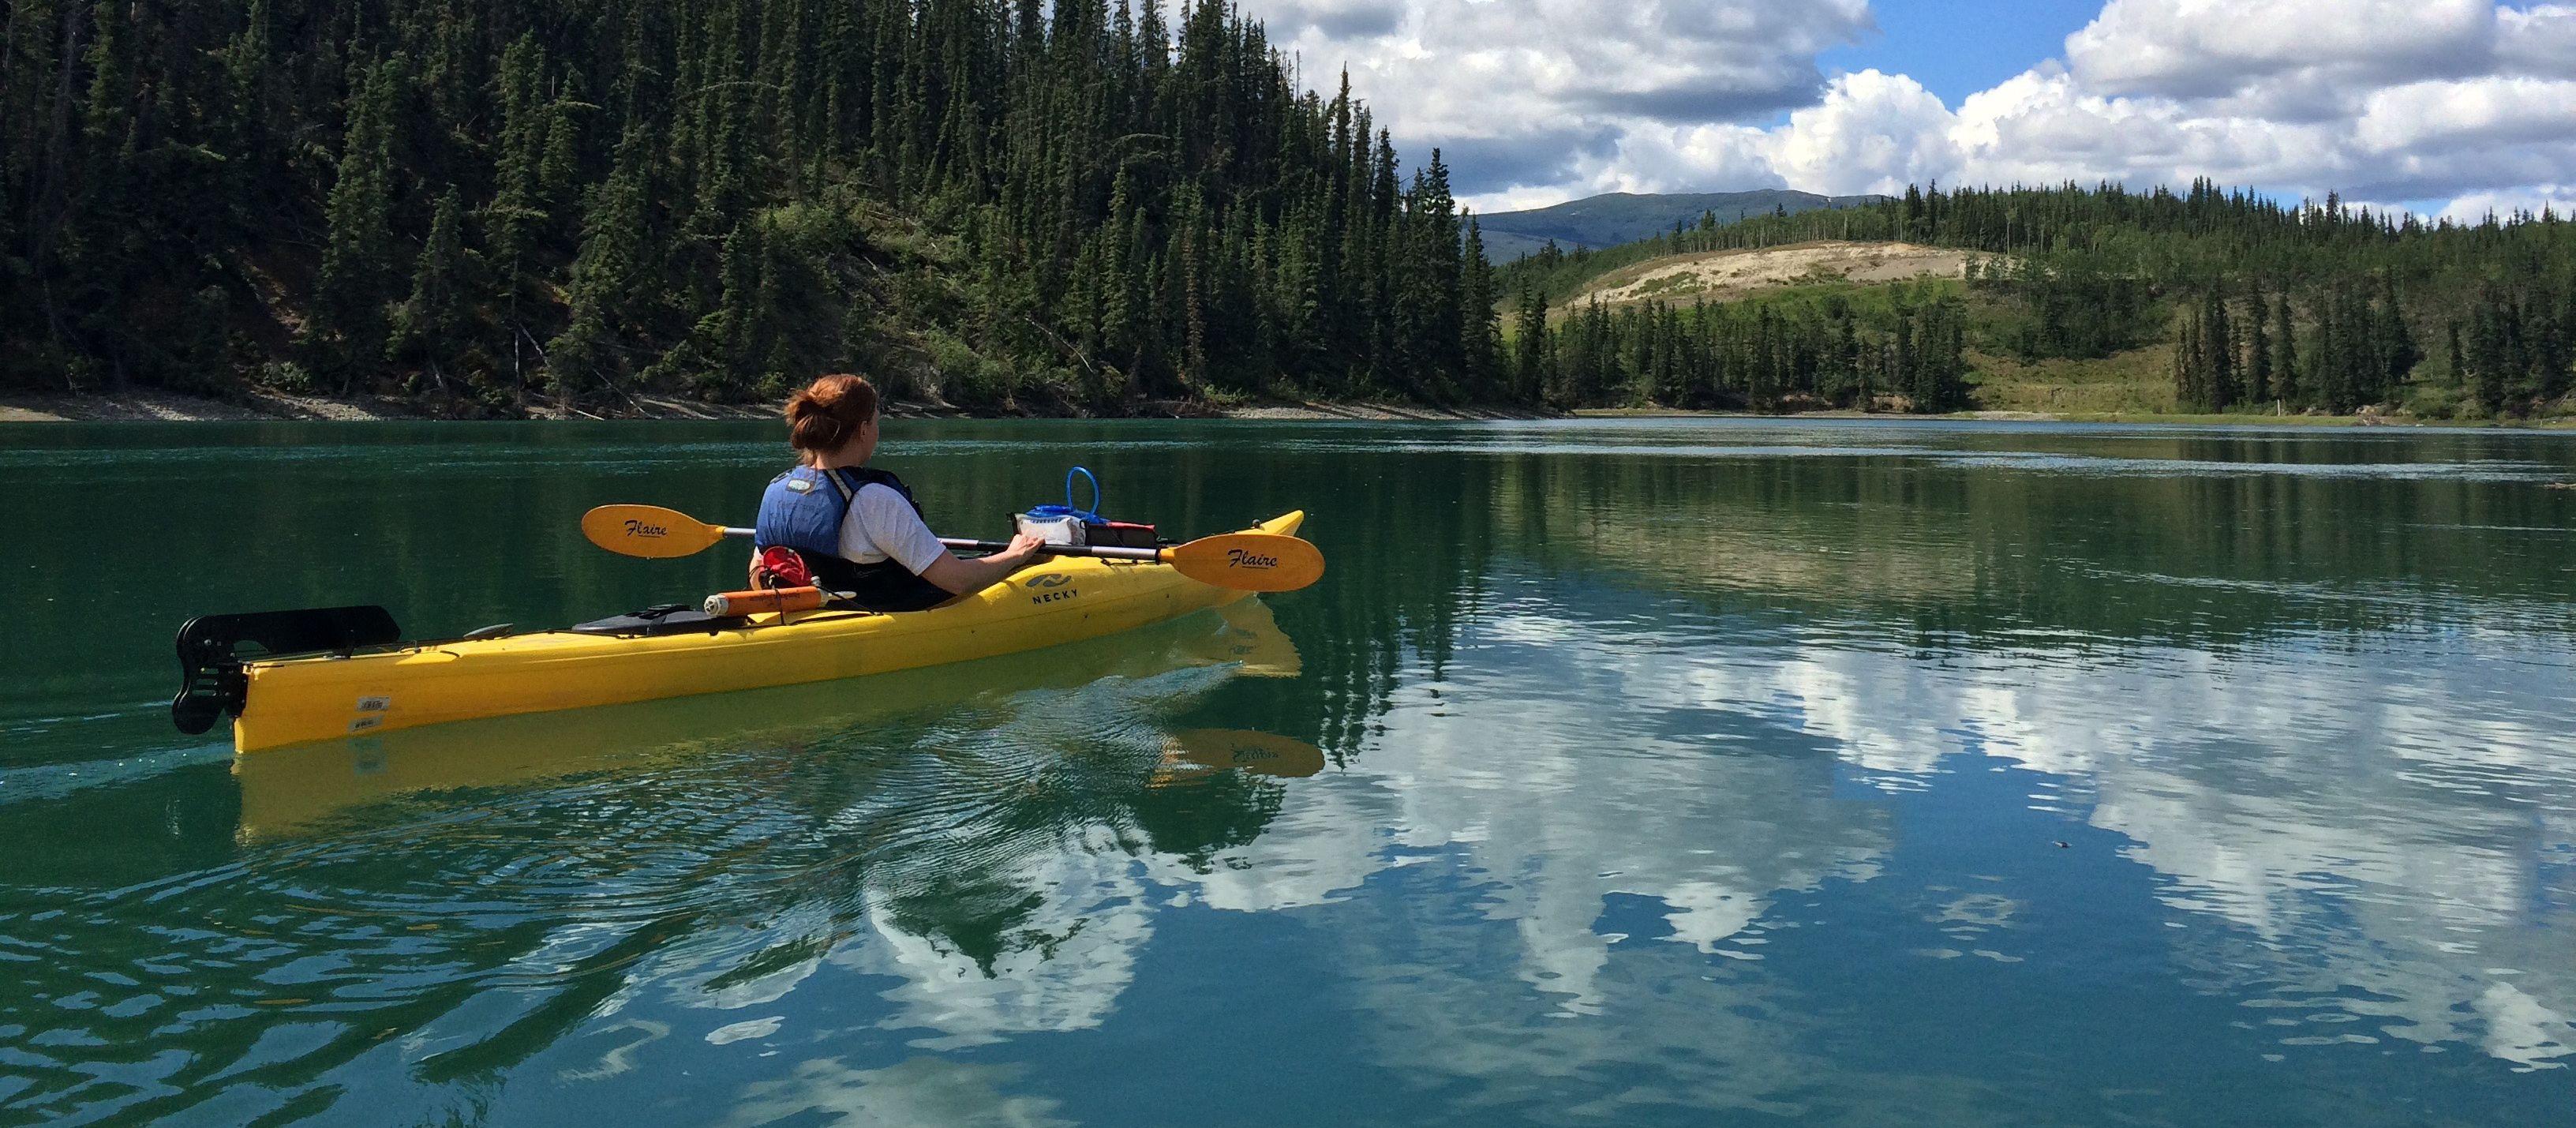 Odette im Kanu auf dem Yukon River